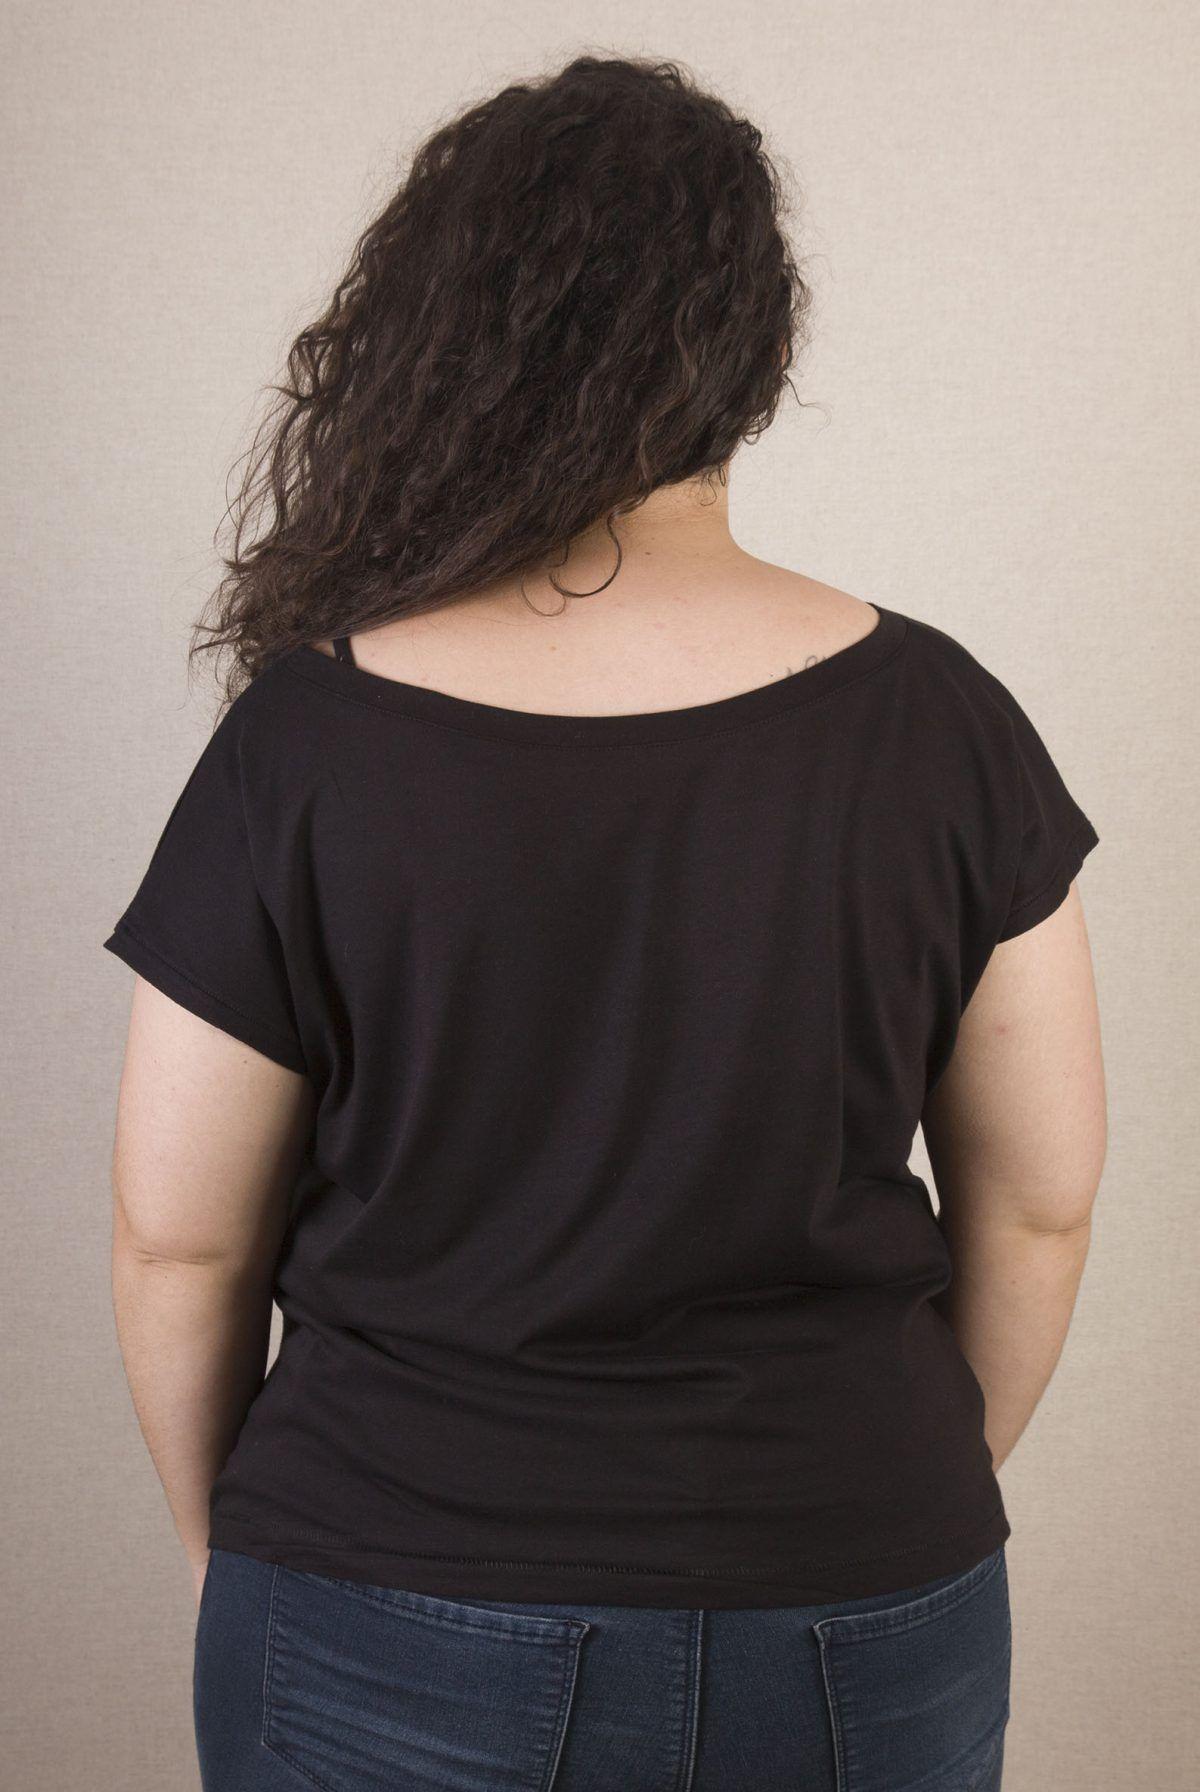 Camiseta baobab mujer-sirem wild